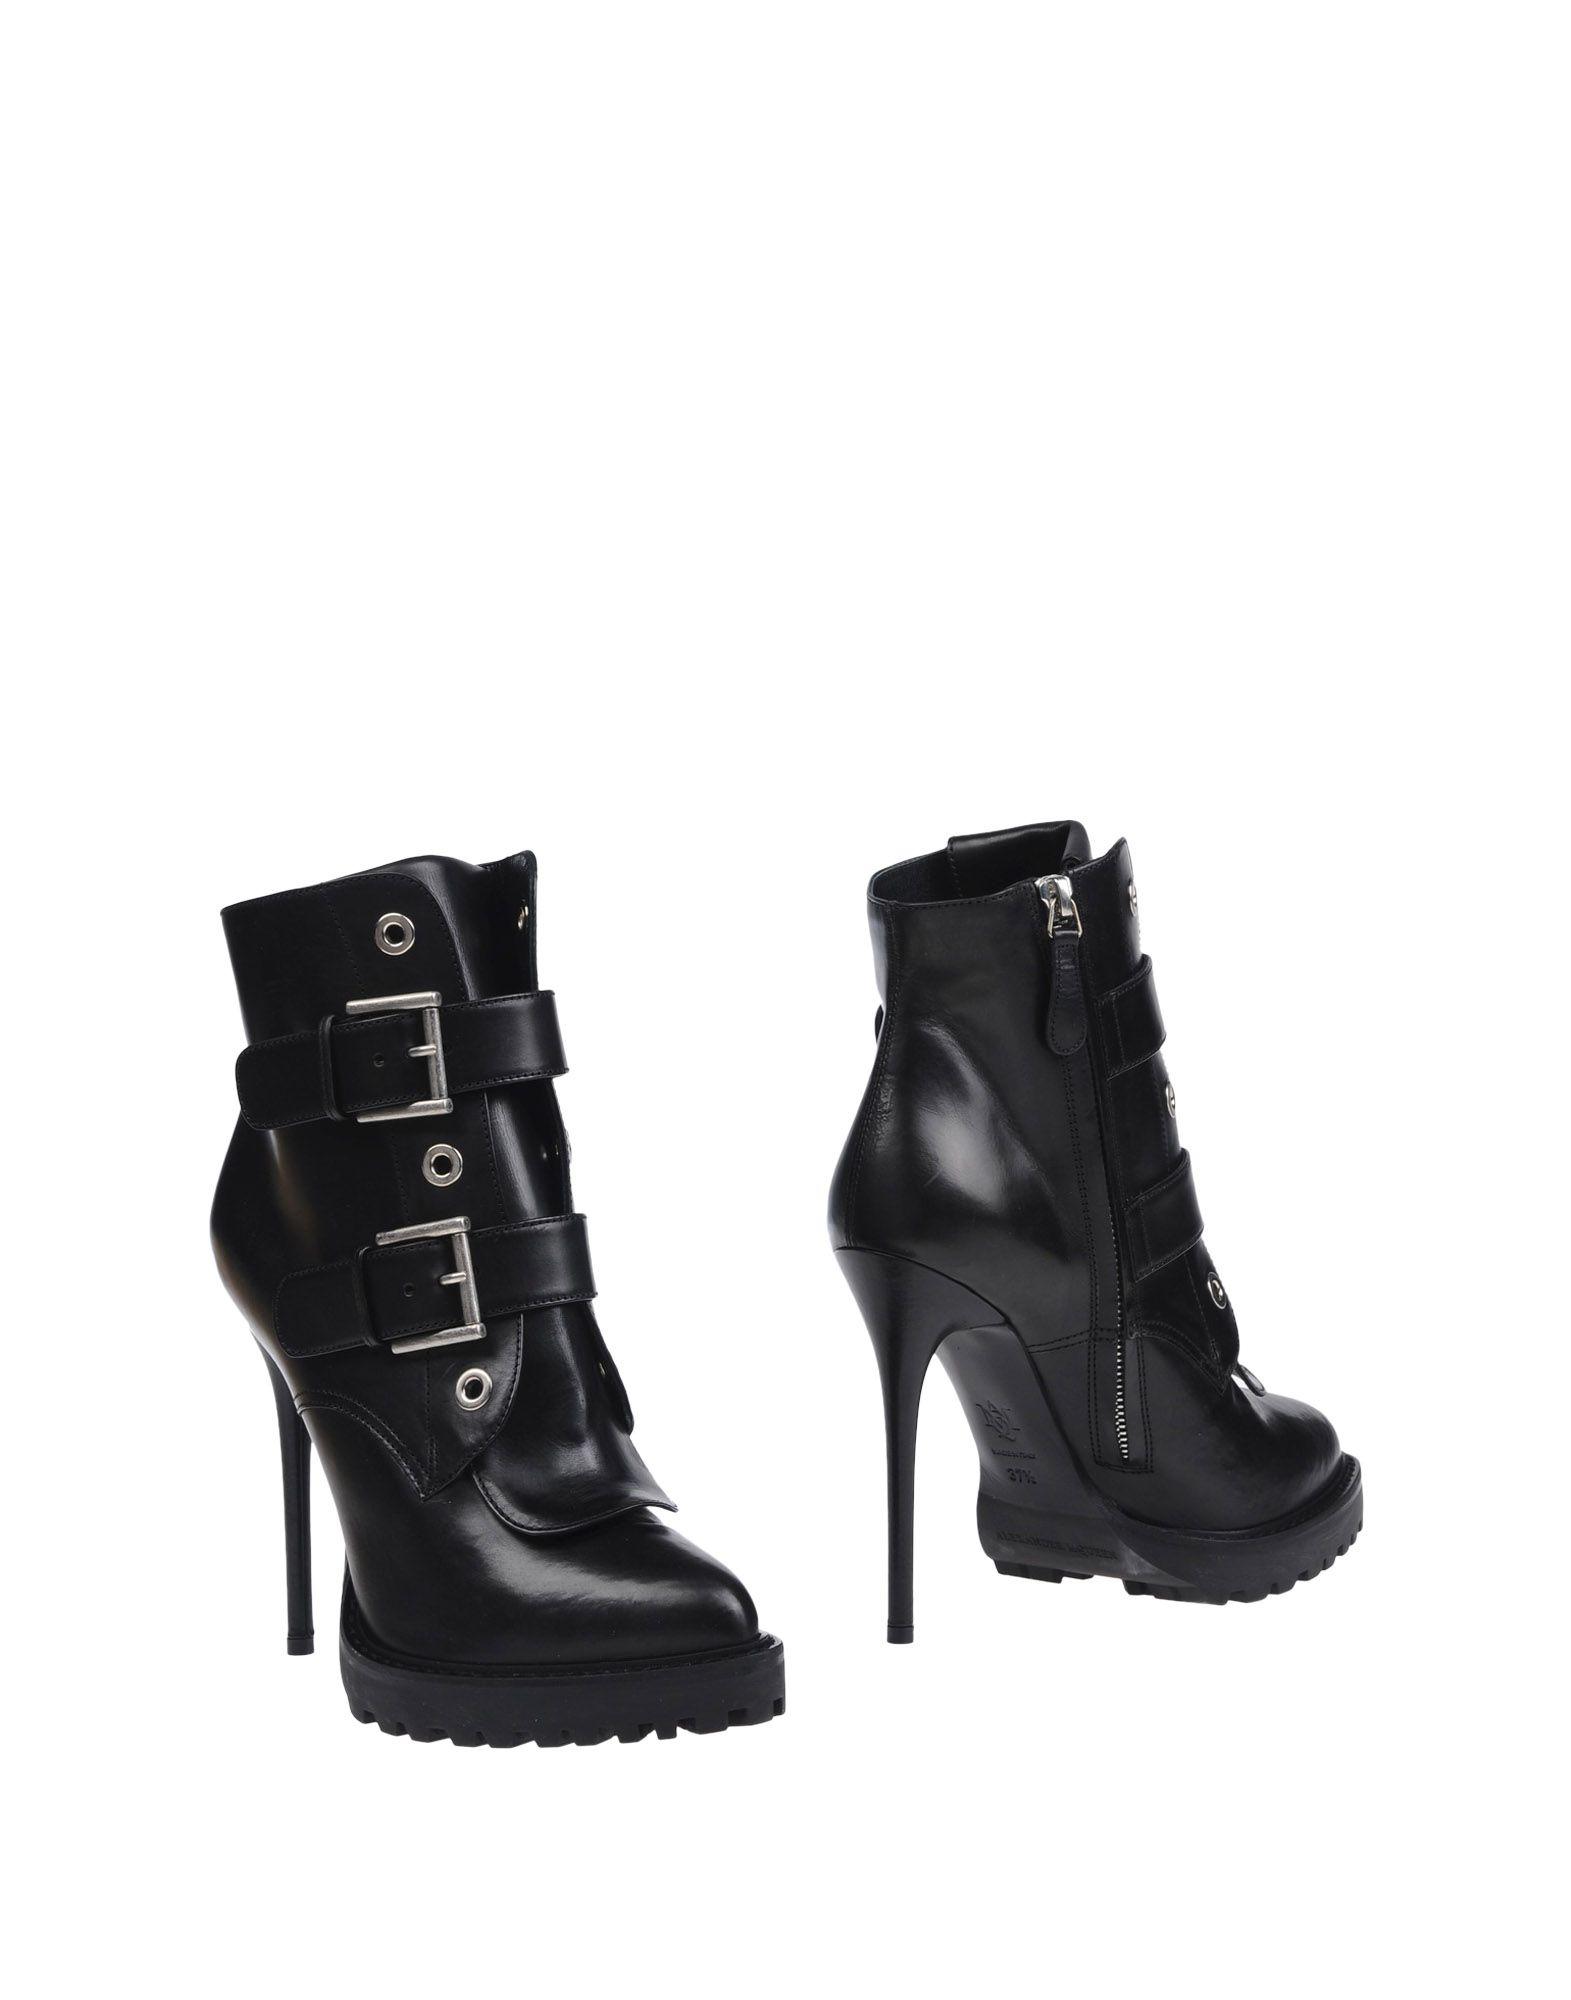 Alexander Mcqueen Stiefelette Damen  11230163LF Beliebte Schuhe Schuhe Beliebte 1227be